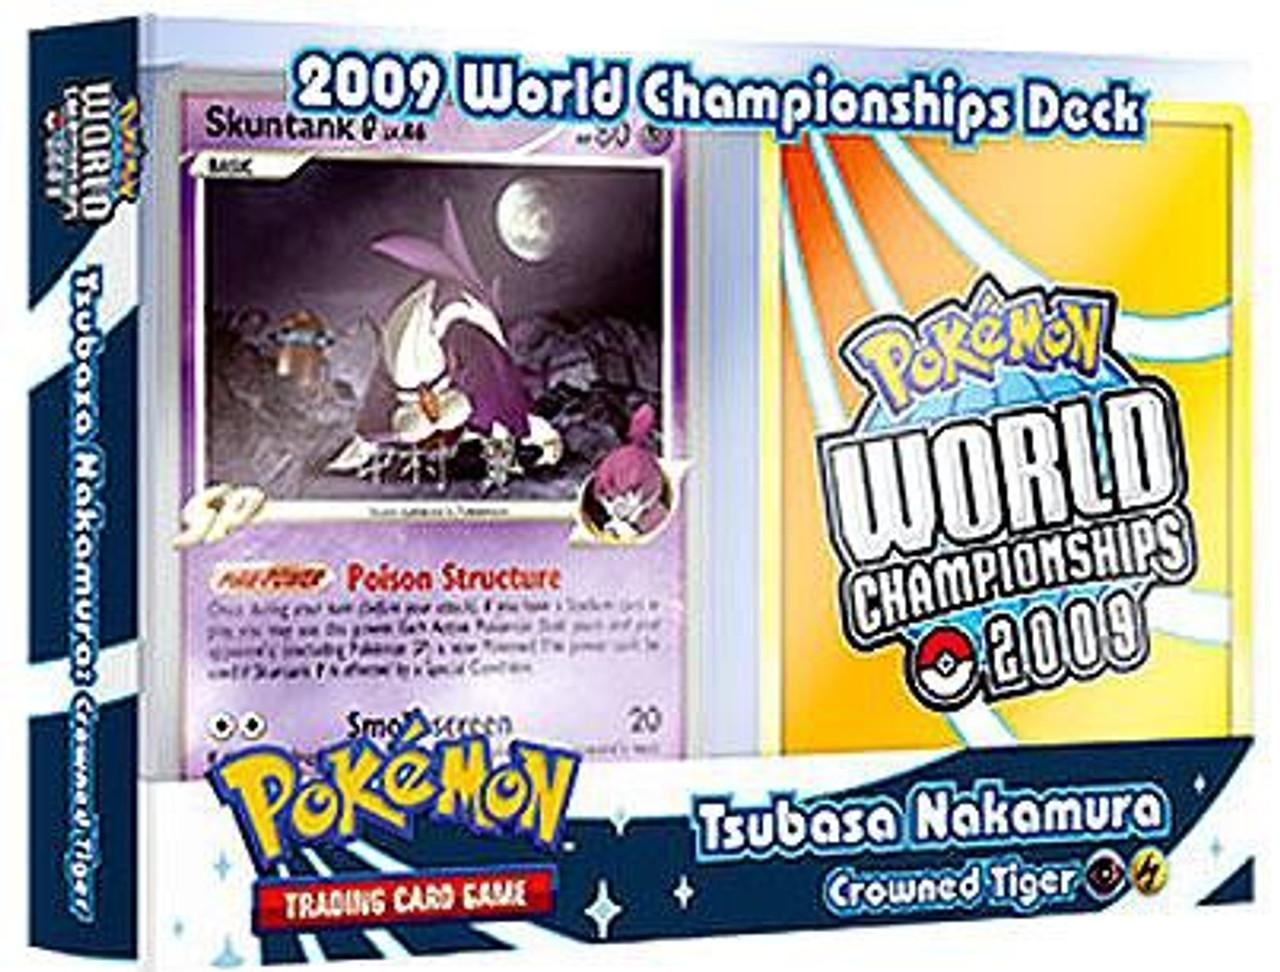 Pokemon World Championships Deck 2009 Tsubasa Nakamura's Crowned Tiger Deck